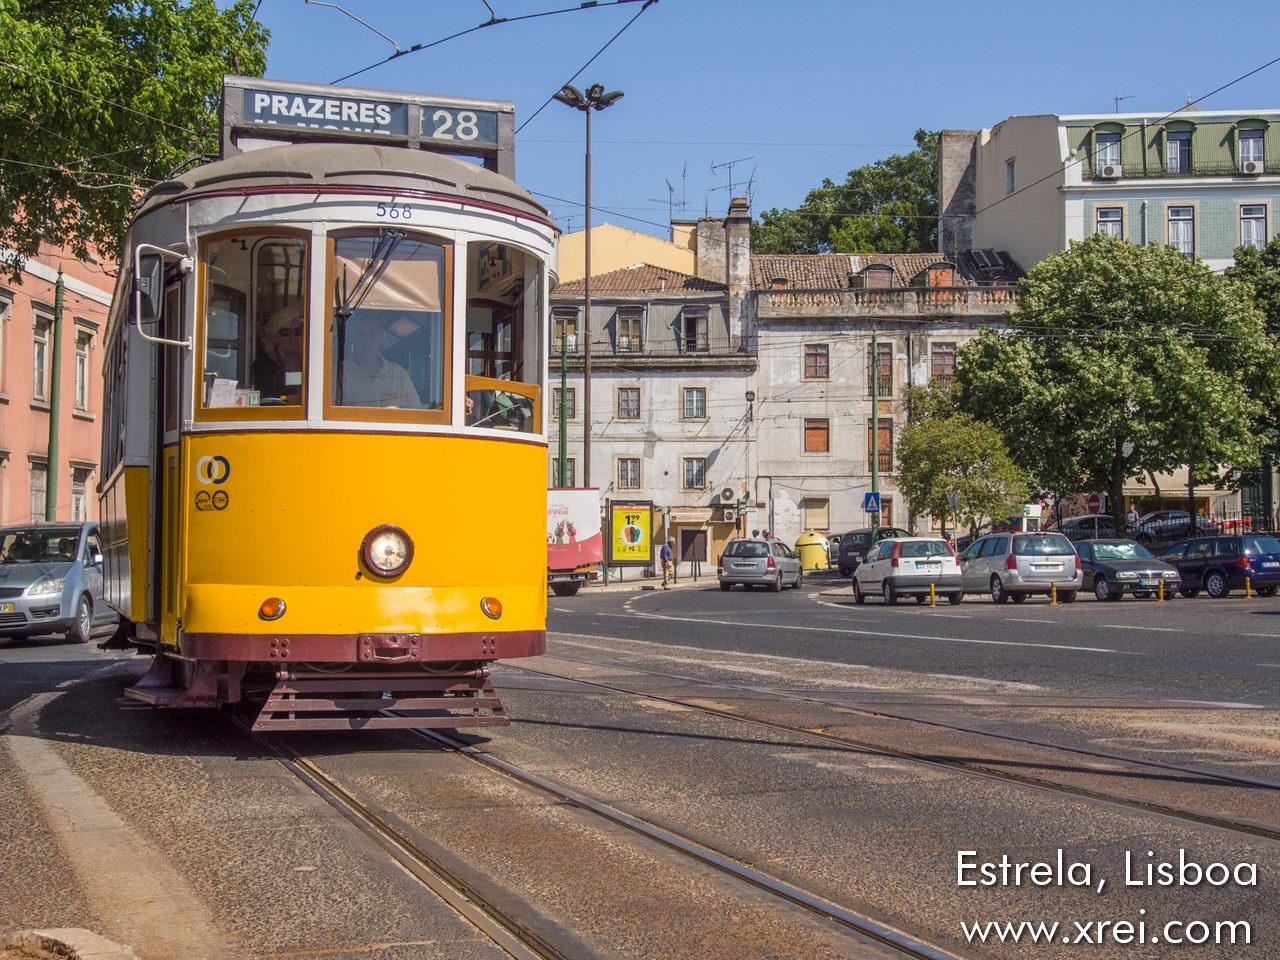 Bairro da Estrela, a traditional residential neighborhood in Lisbon centrally located in the traditional center of Lisbon, on a hill near the river, between the neighborhoods of Lapa, São Bento, Rato and Amoreiras